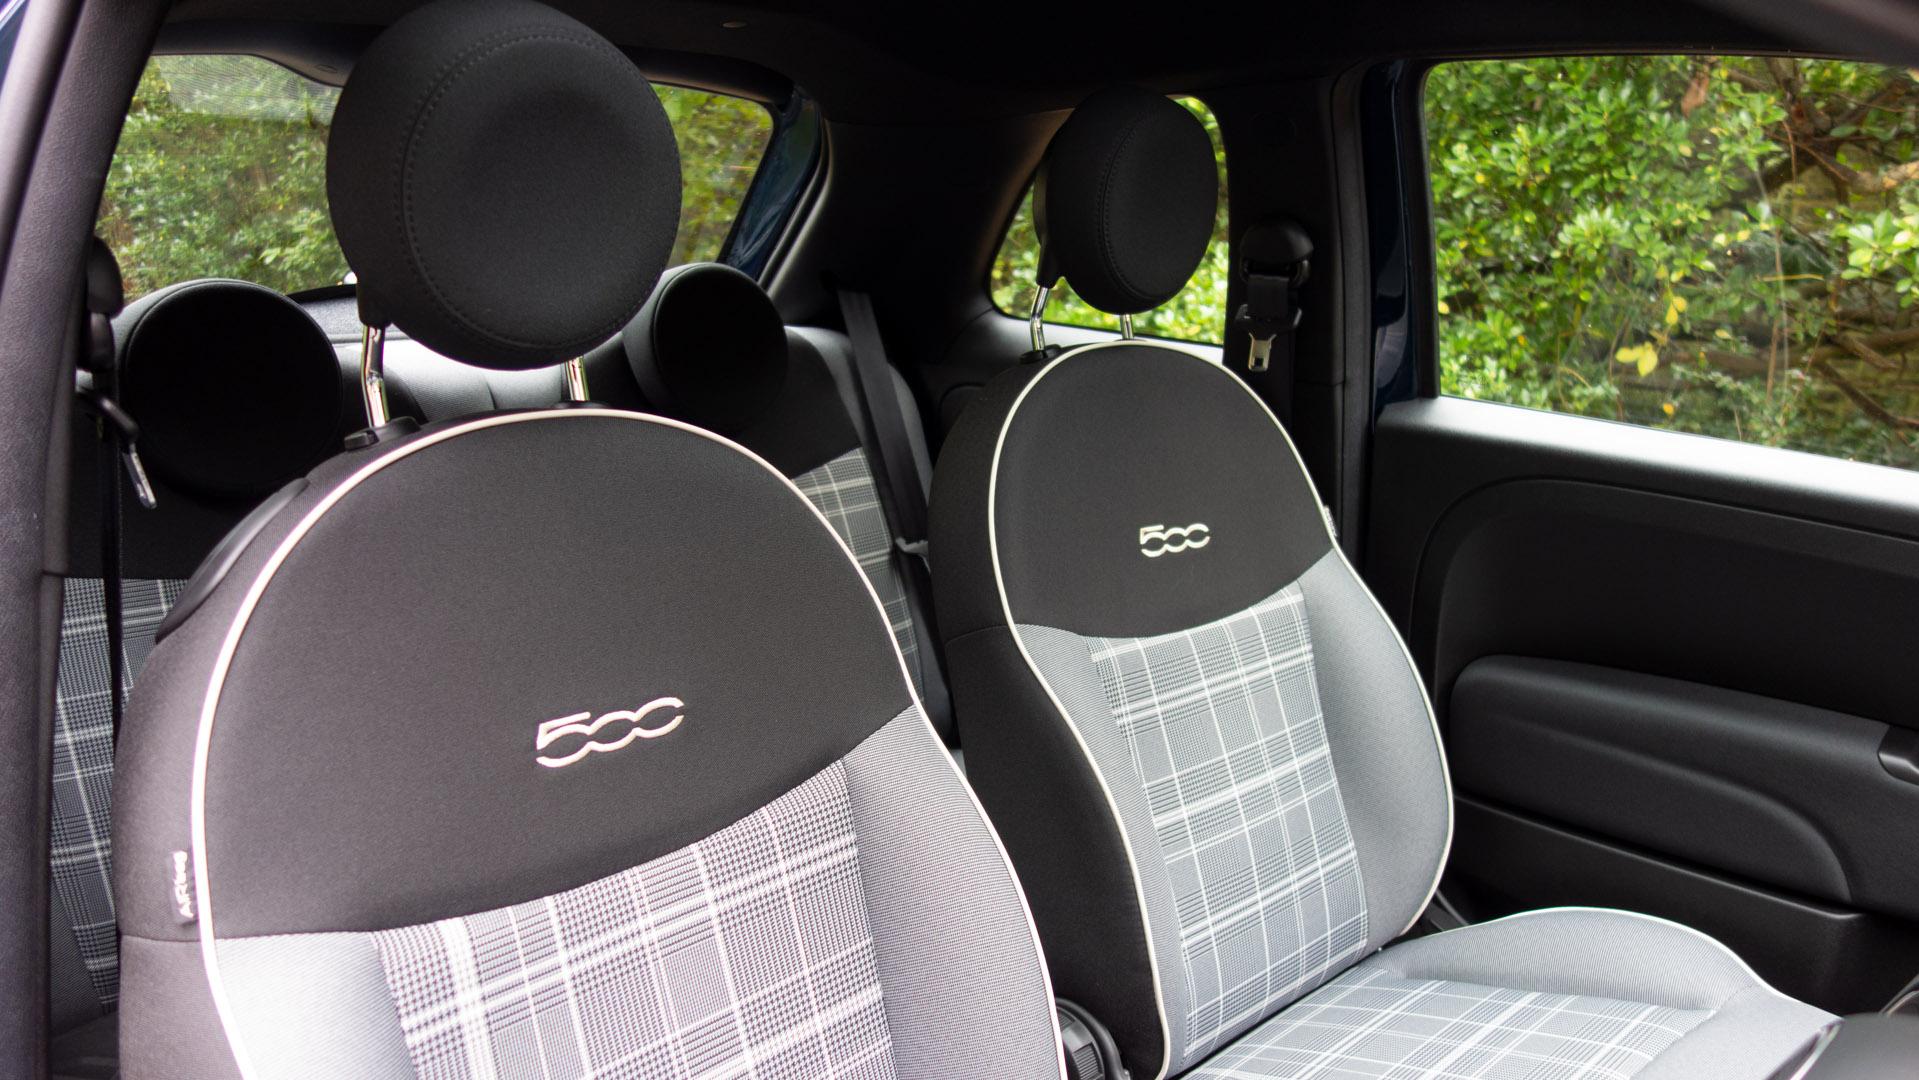 Fiat 500 Hybrid seats